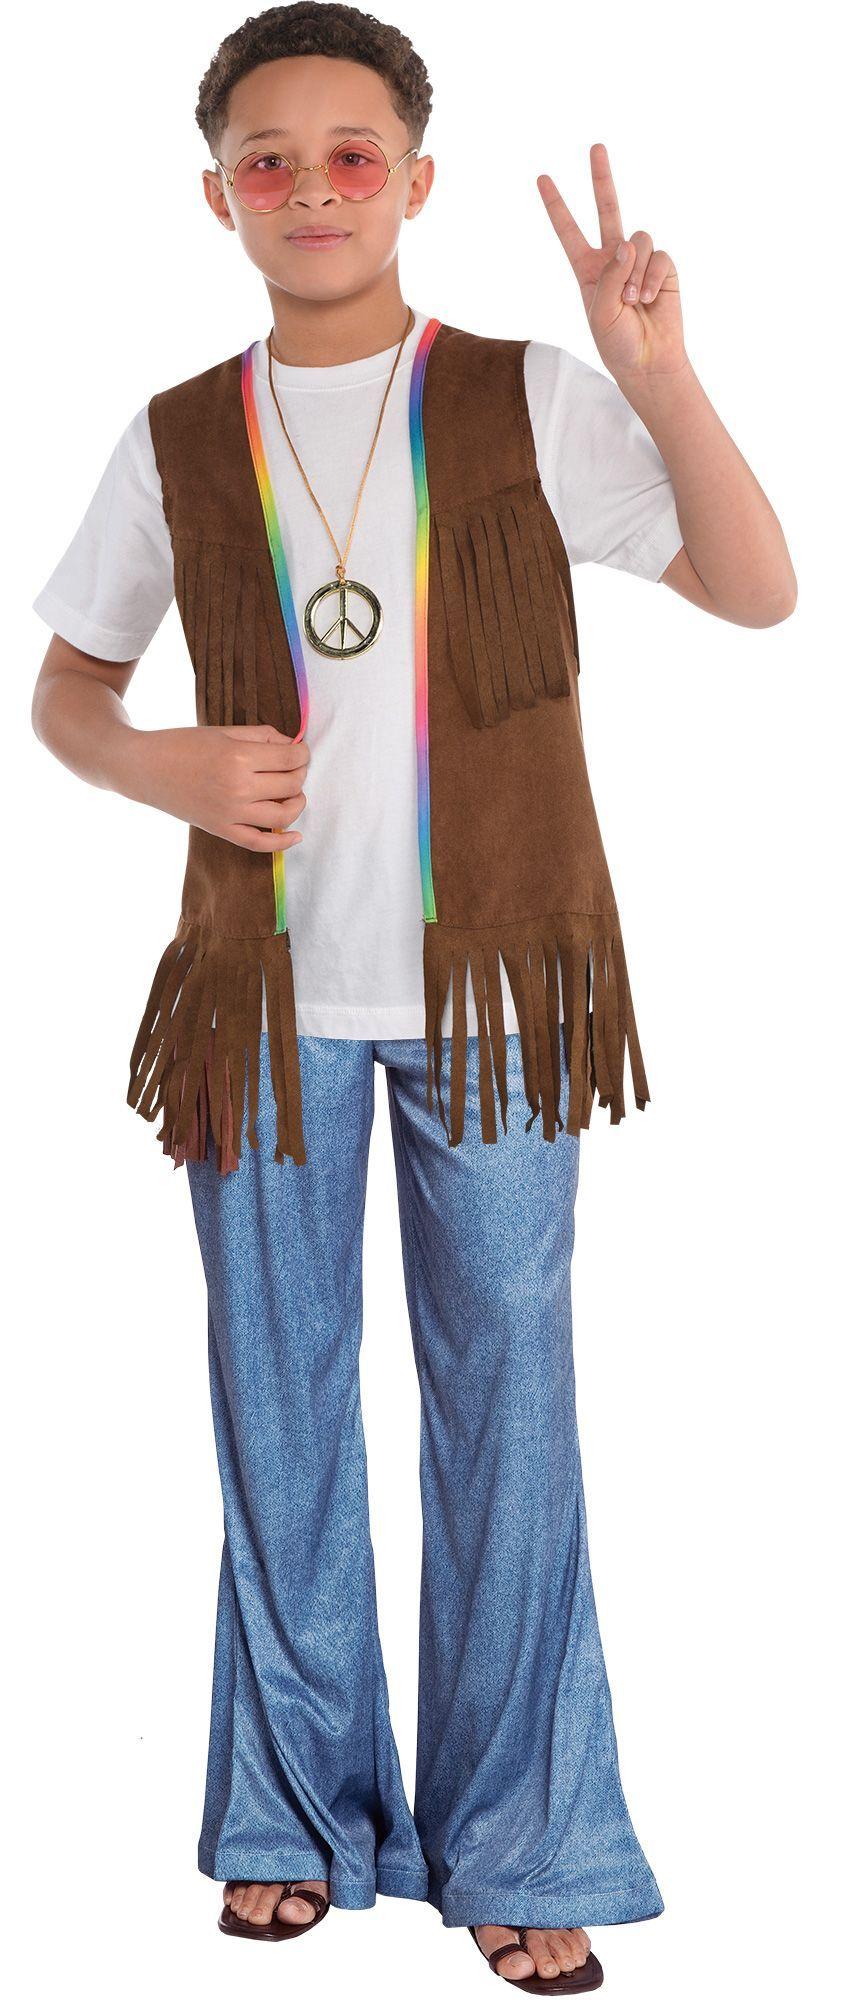 Diy hippie costume also heather taylor joyfrog on pinterest rh